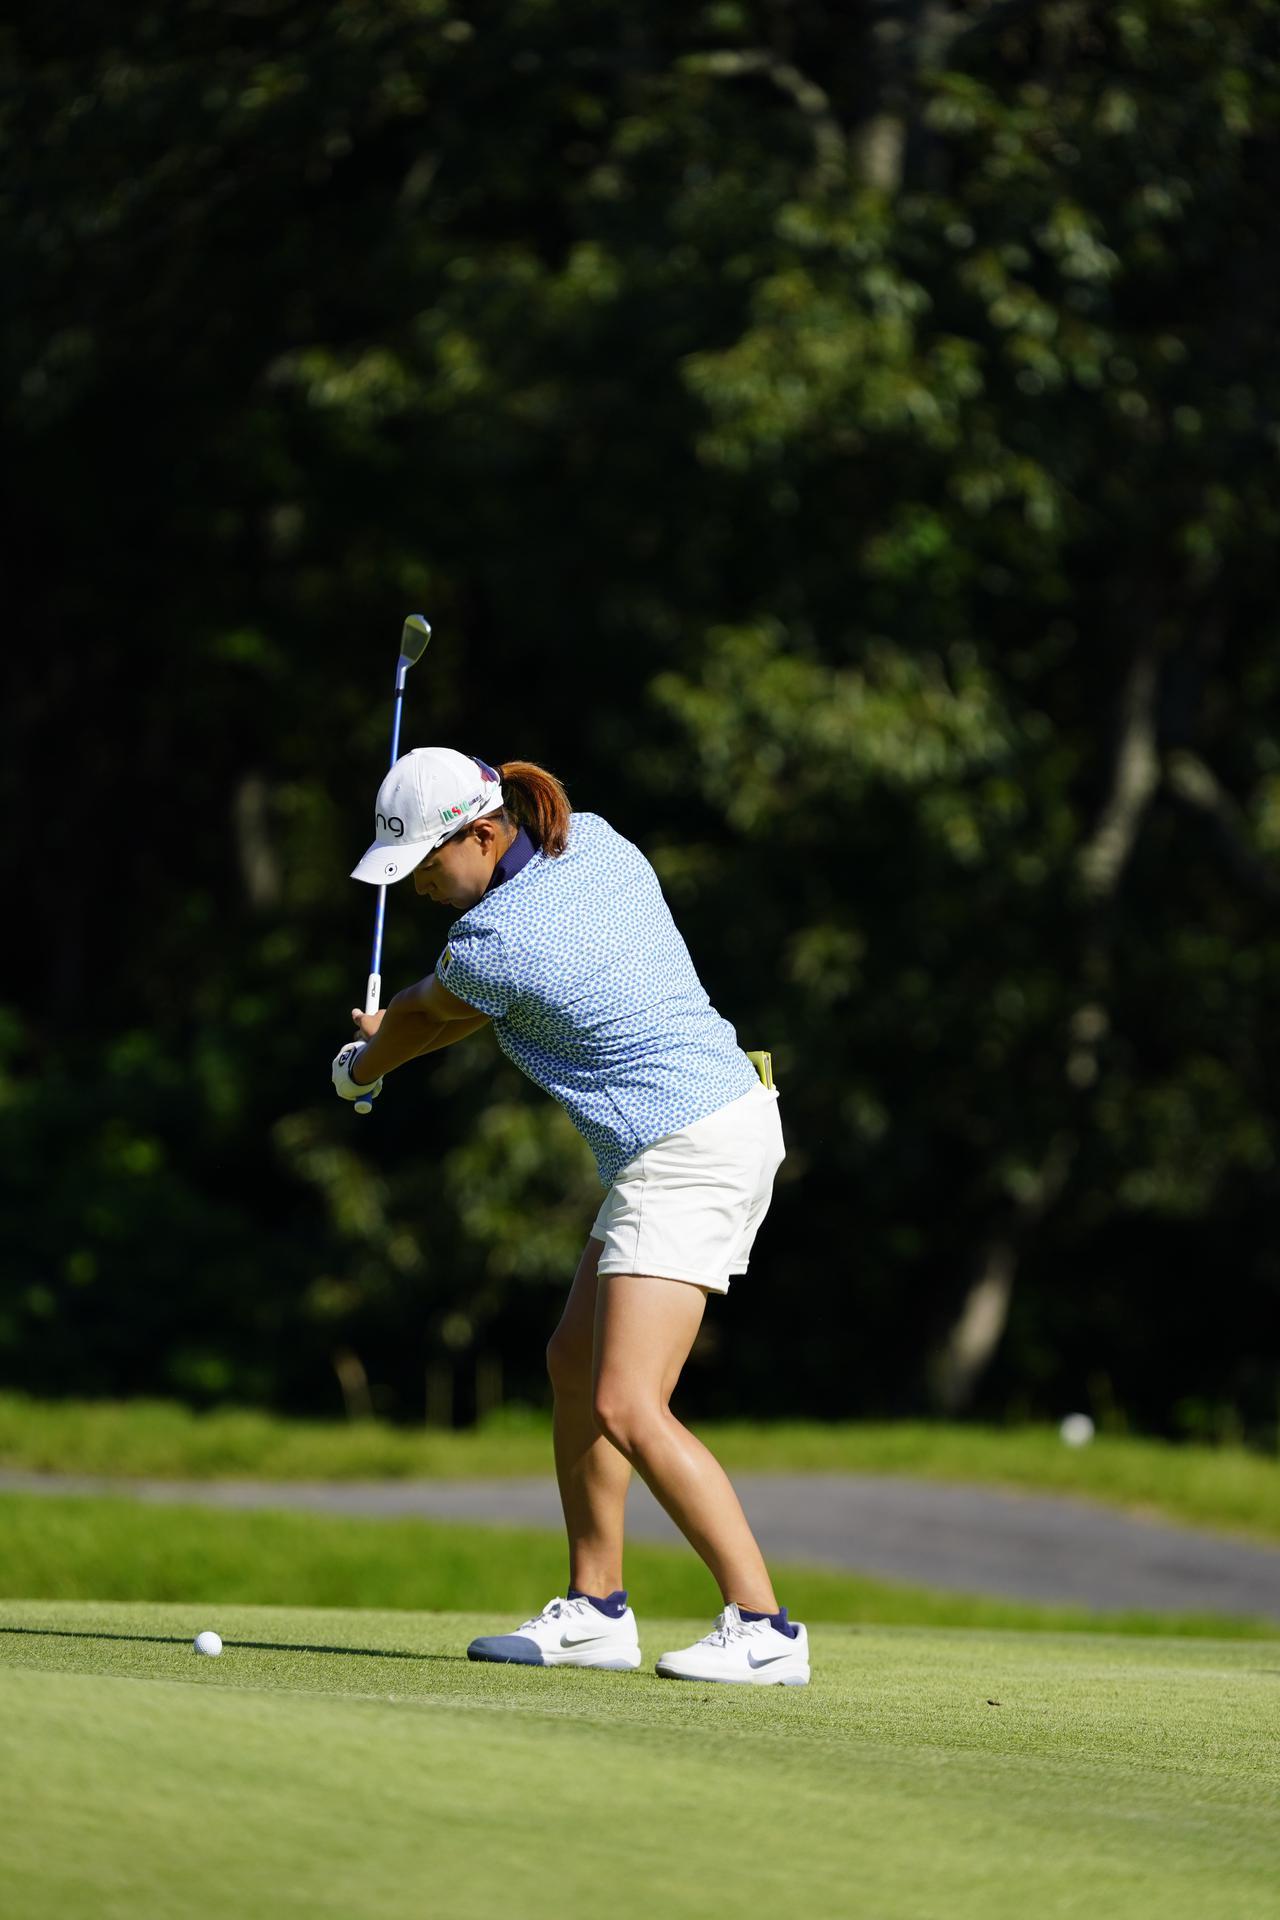 Images : 4番目の画像 - 渋野日向子 アイアン連続写真 - みんなのゴルフダイジェスト